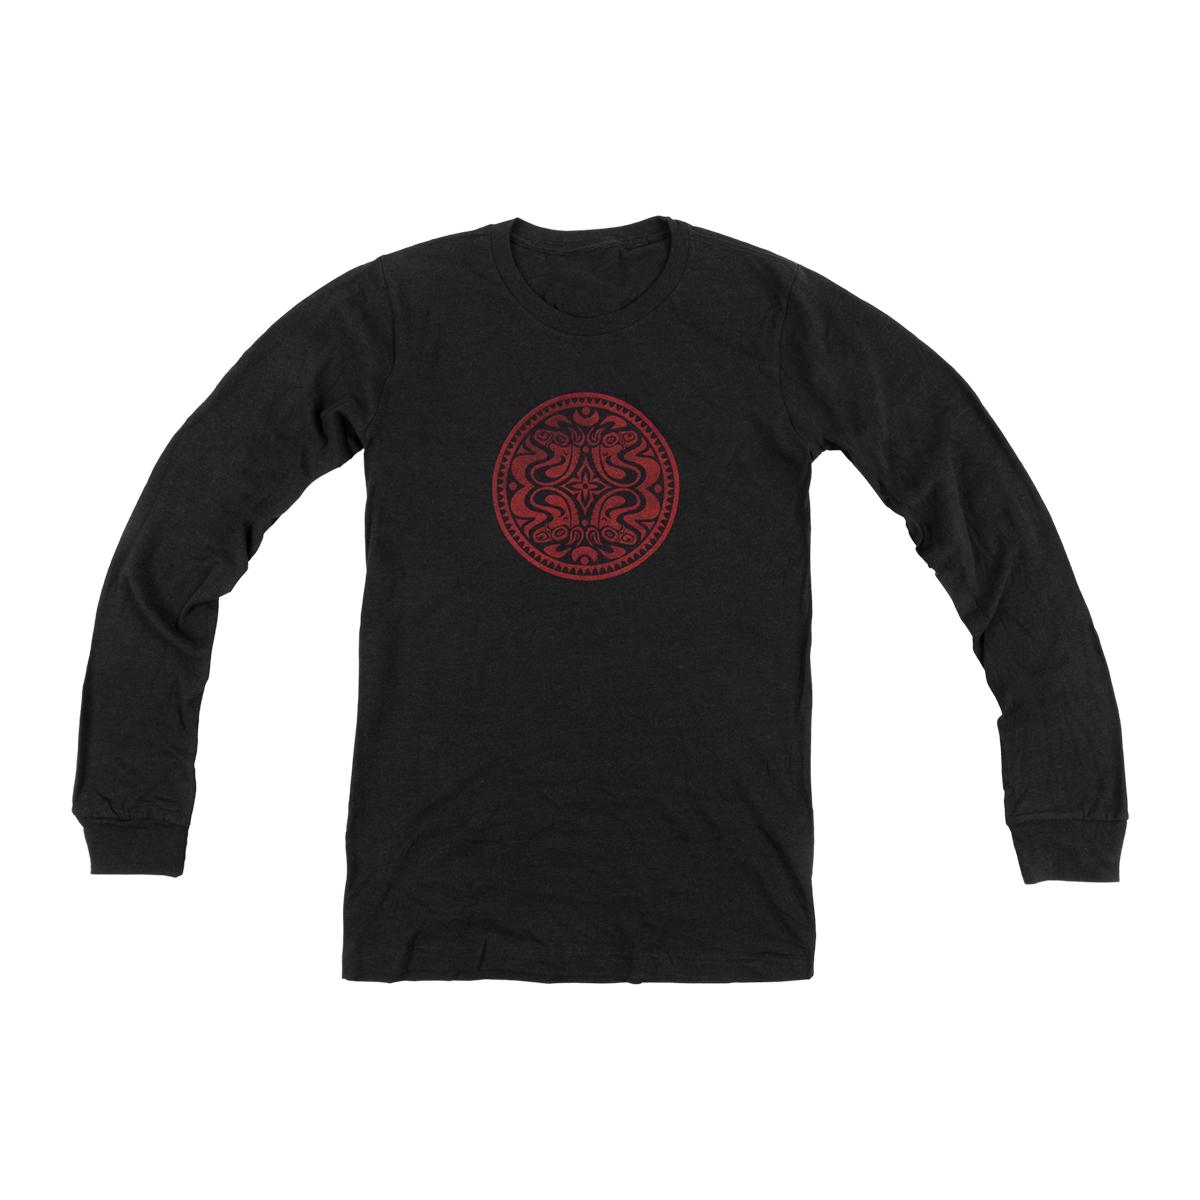 Heather Black Quattro Dose Long-Sleeve T-Shirt